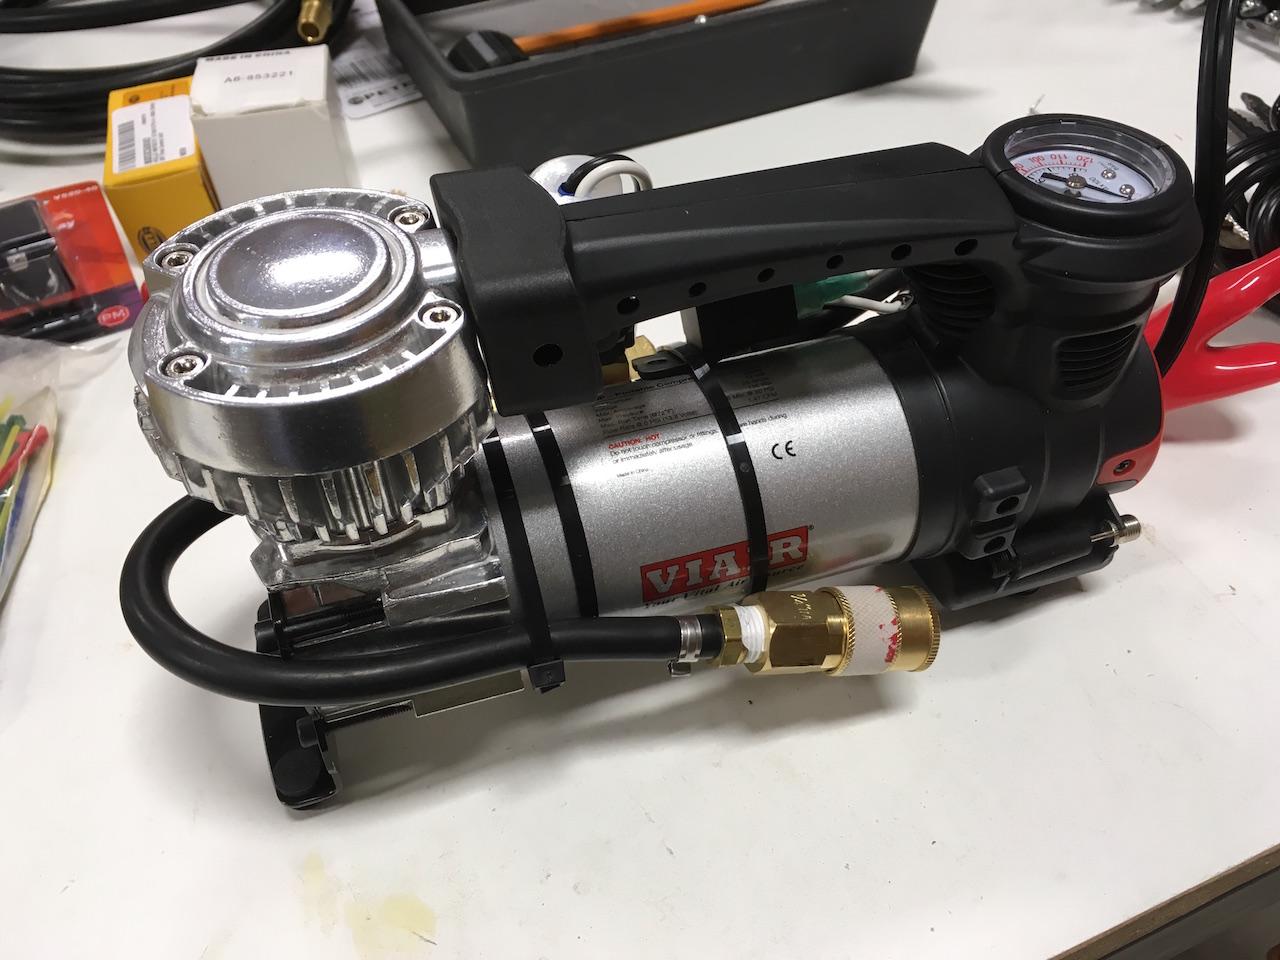 Air Compressor Mod - R-pod Owners Forum